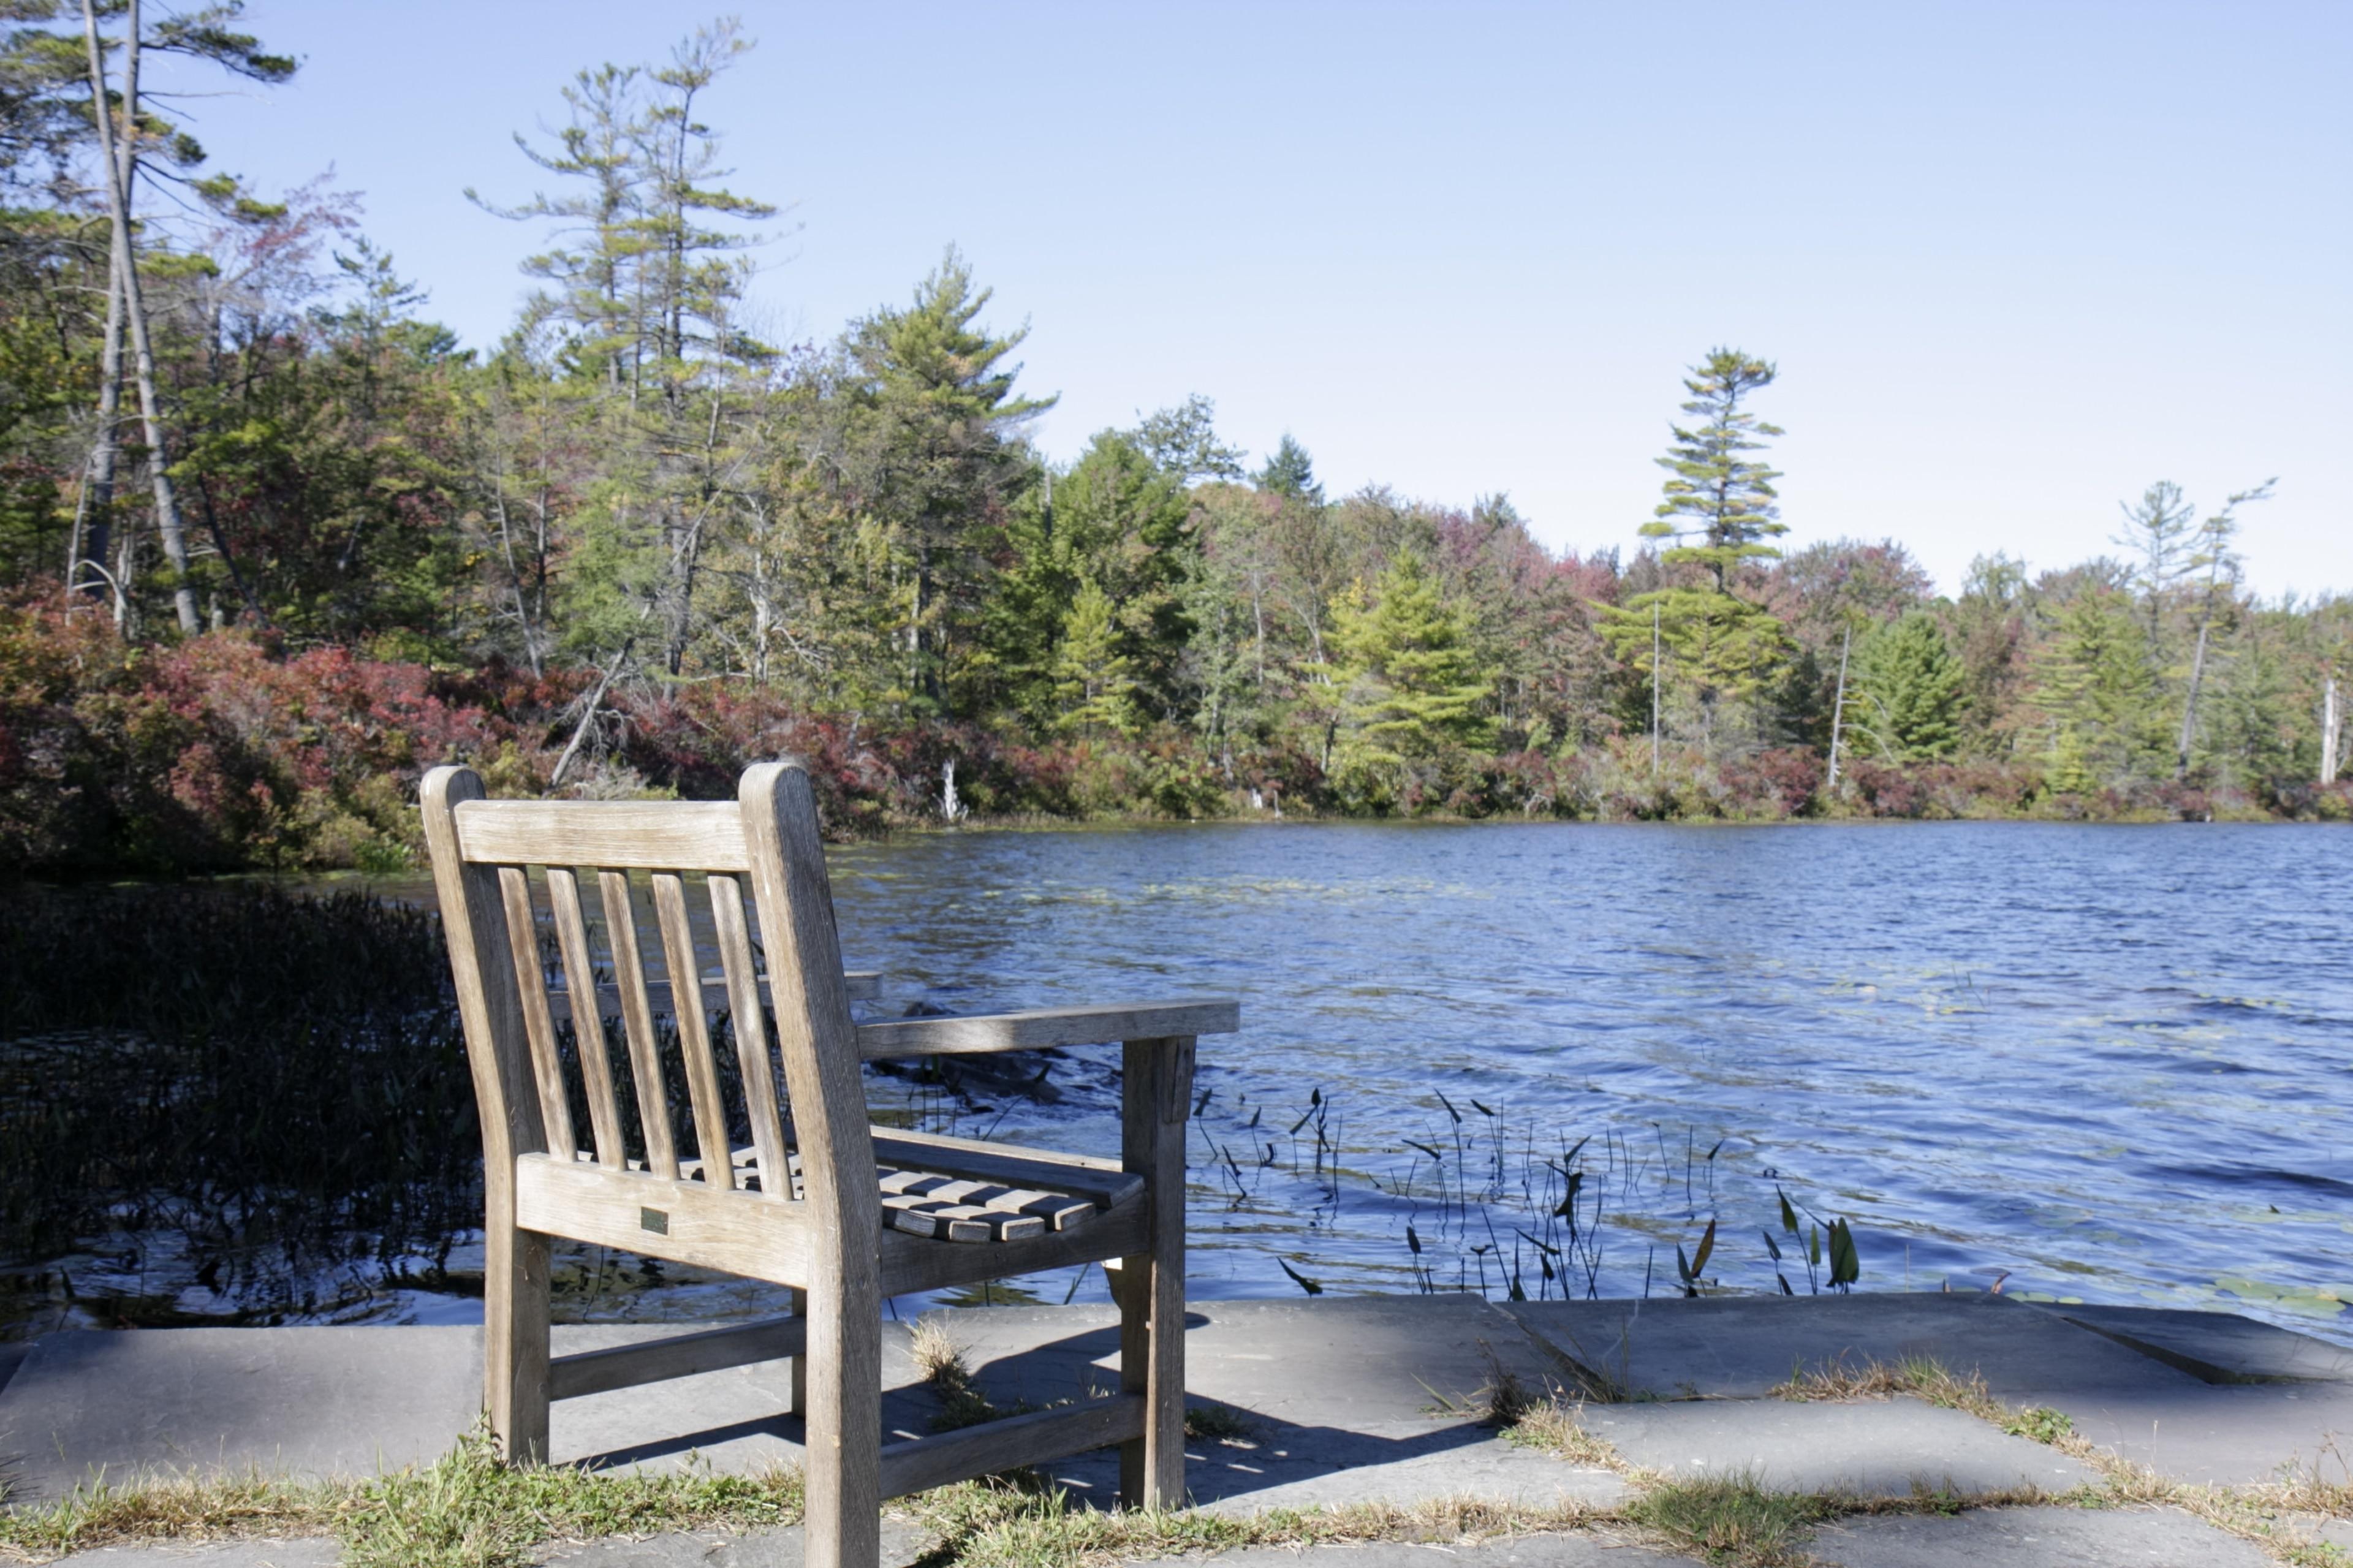 Lake Ariel, Pennsylvania, United States of America